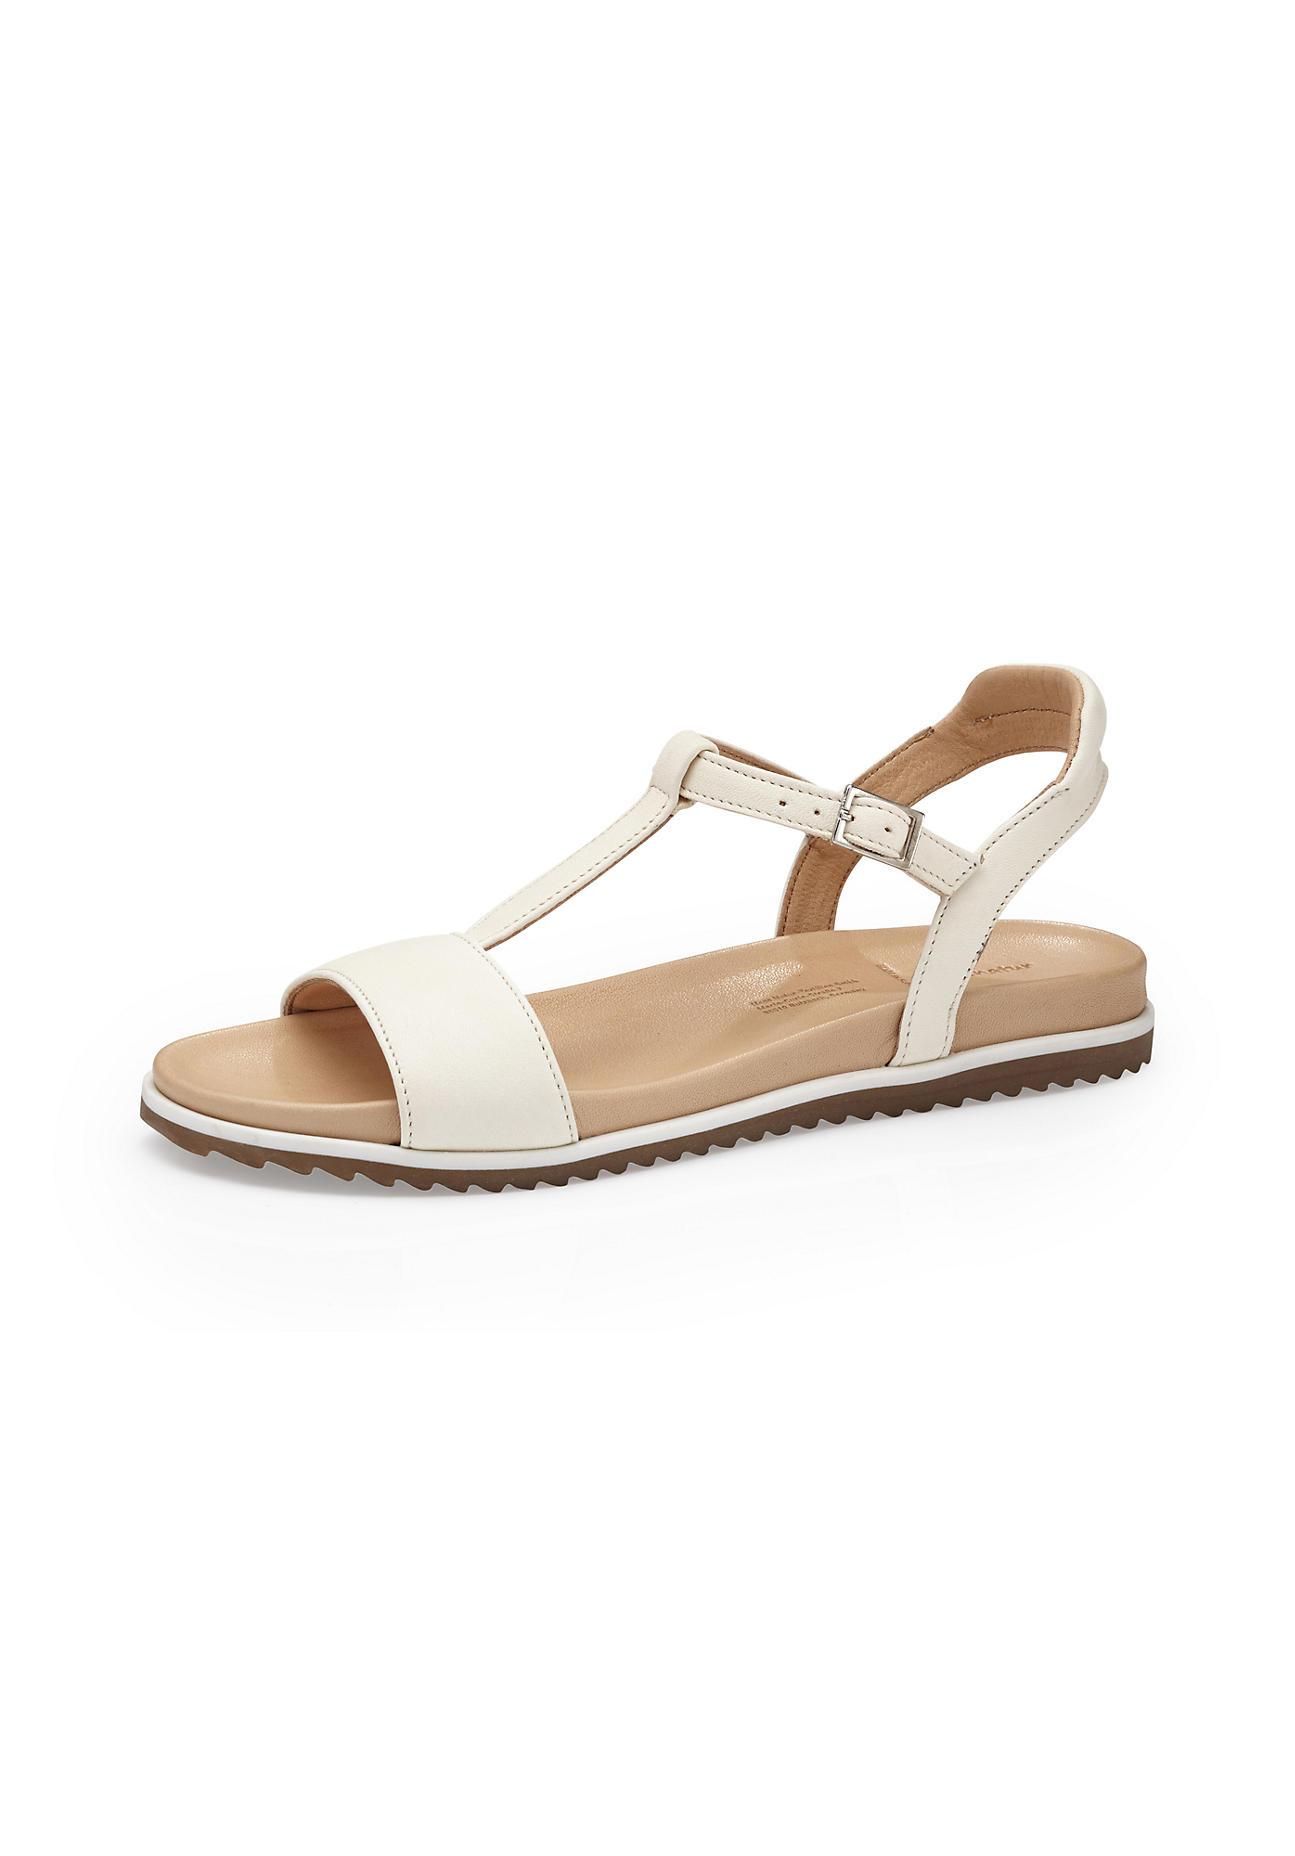 hessnatur Damen Damen Sandale aus Leder – weiß – Größe 41